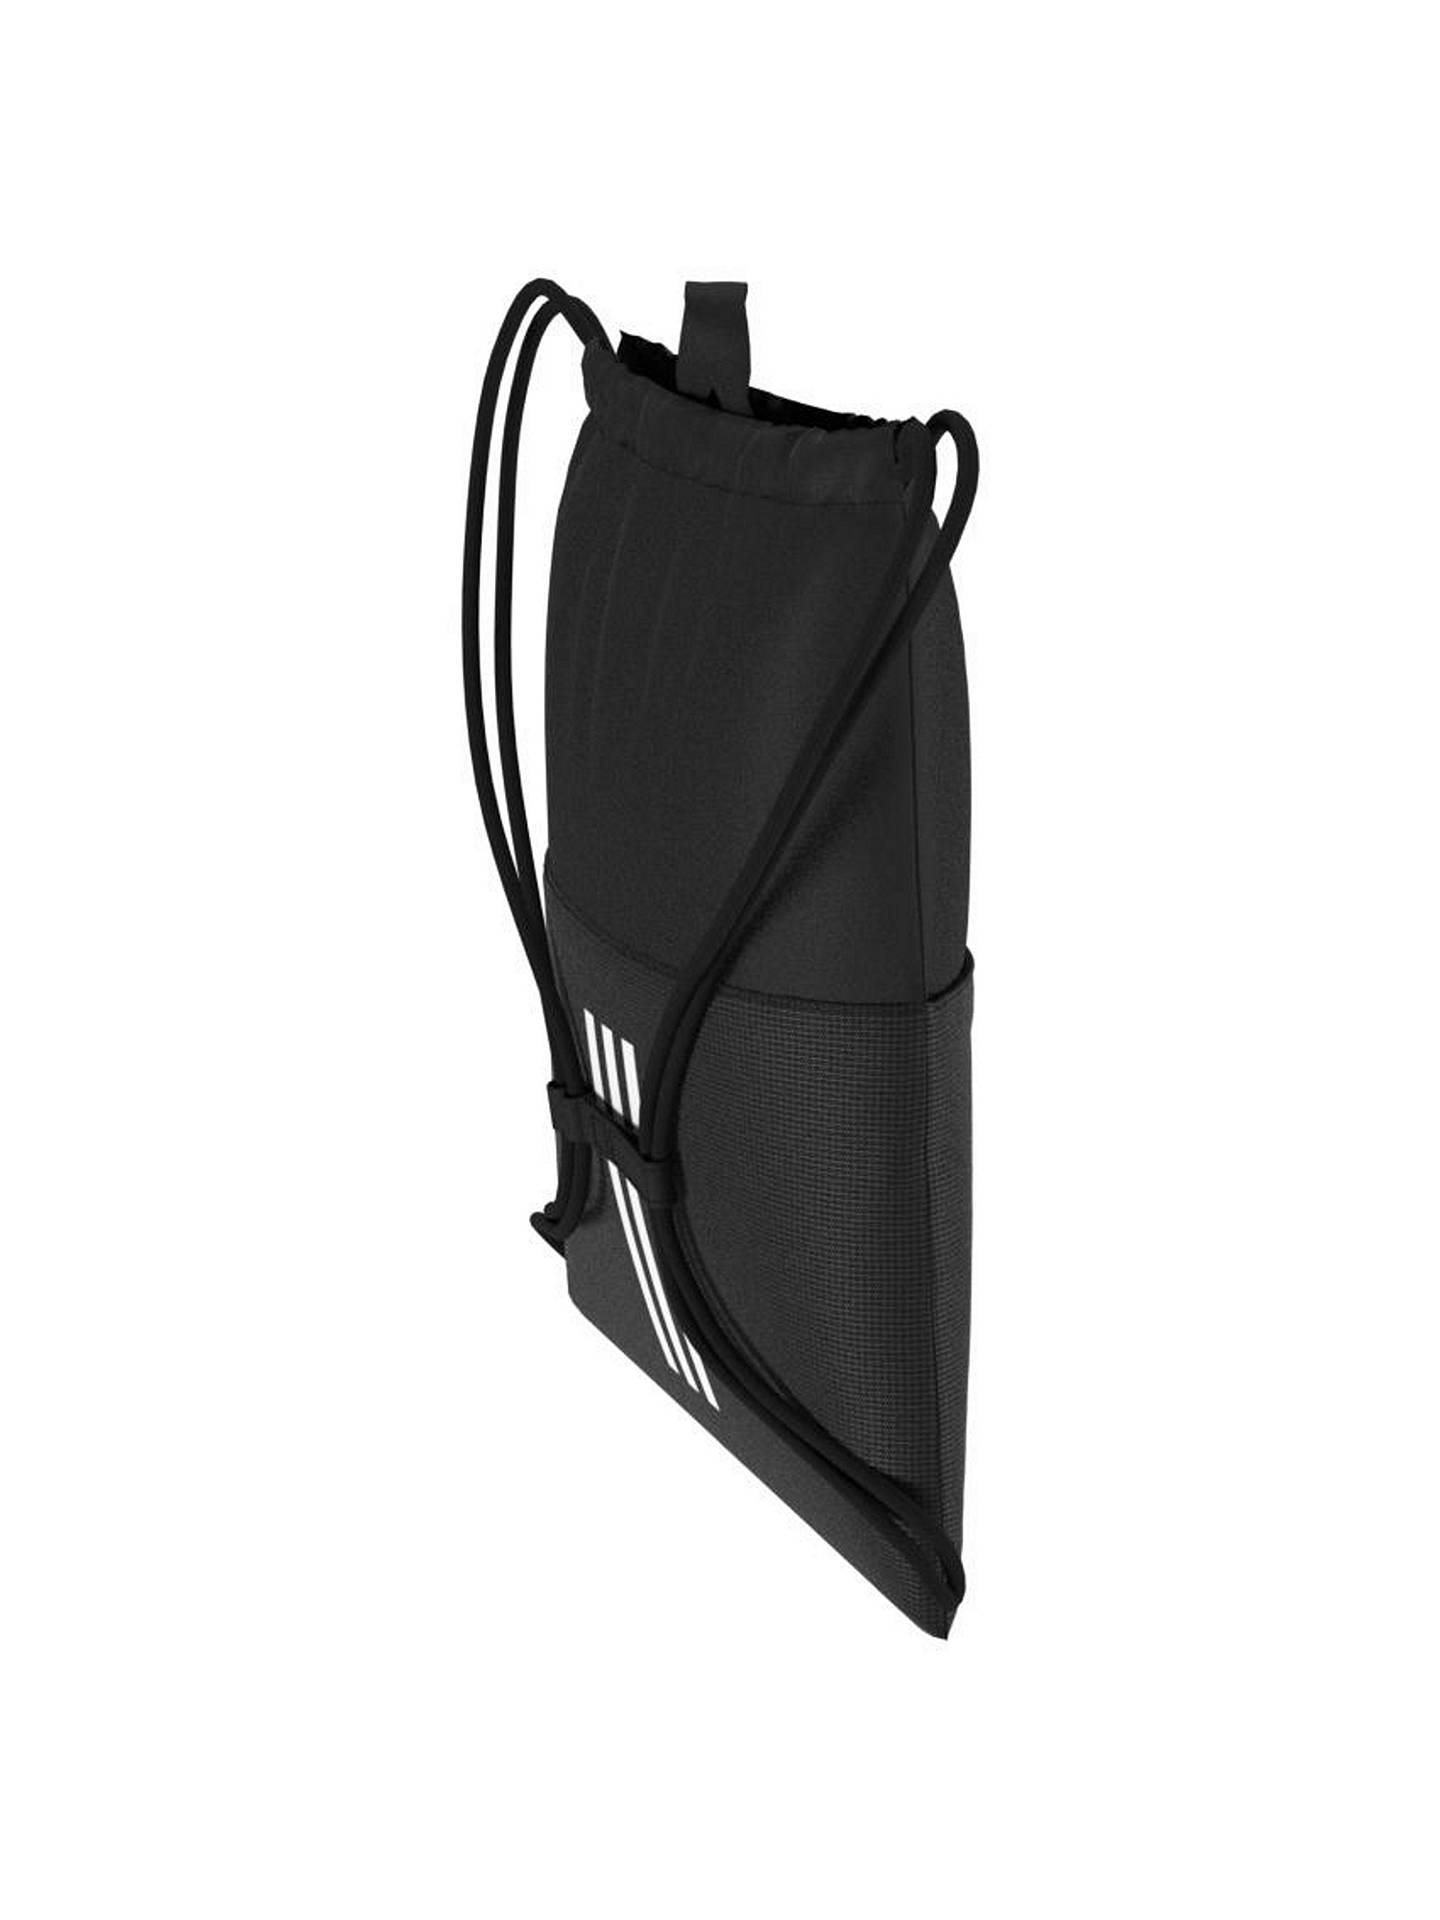 0ba8630382 ... Buy adidas Training Core Gym Bag